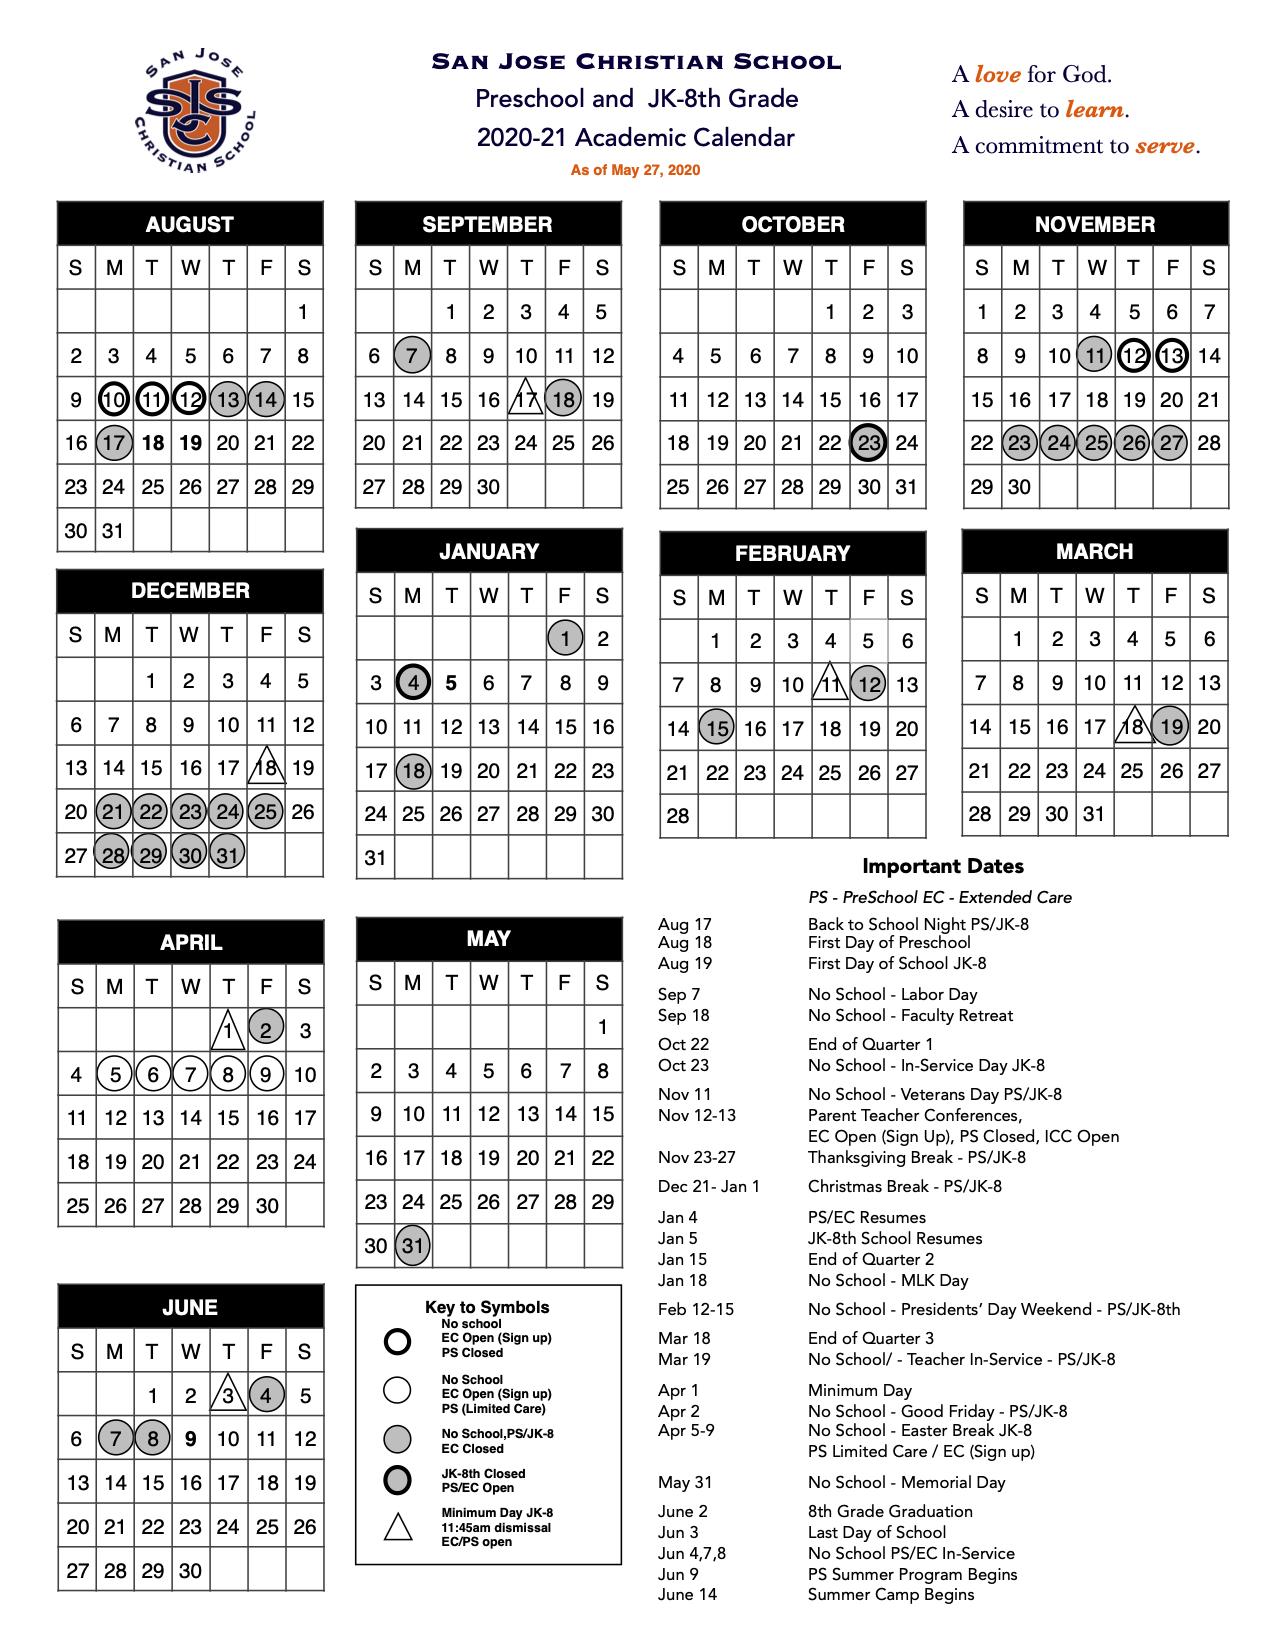 San Jose Christian School Calendar 2020-2021